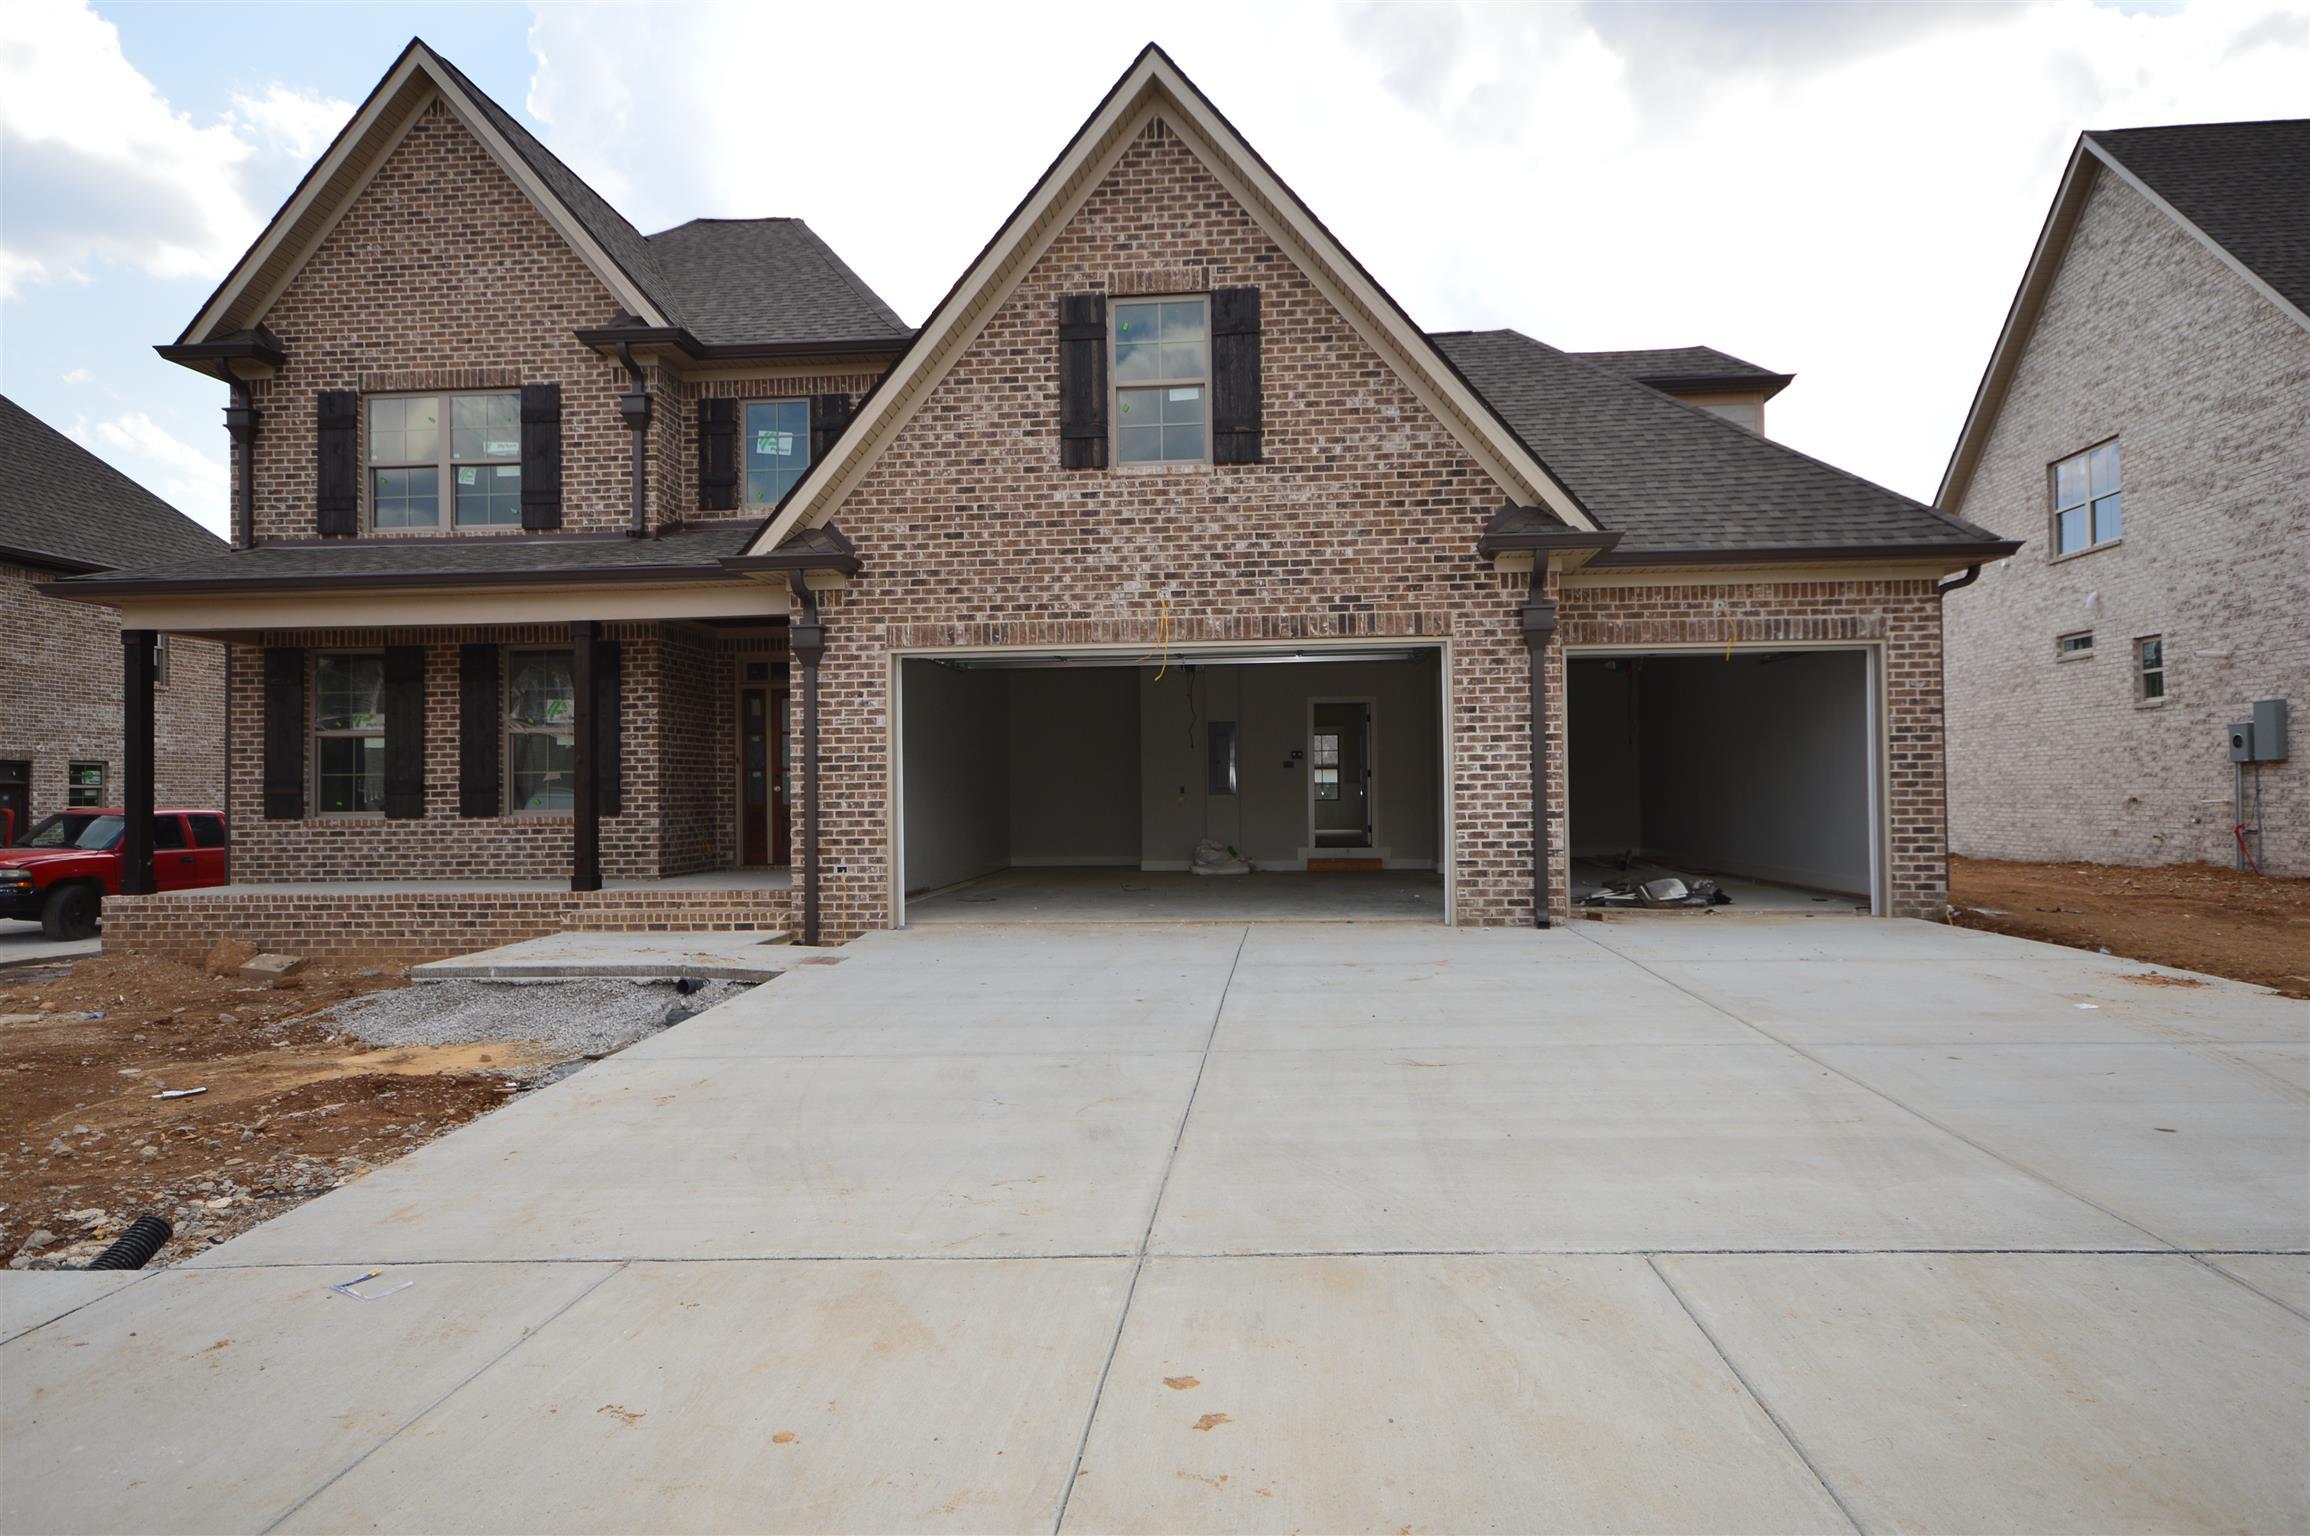 1020 Alpaca Dr. (416), Spring Hill, TN 37174 - Spring Hill, TN real estate listing